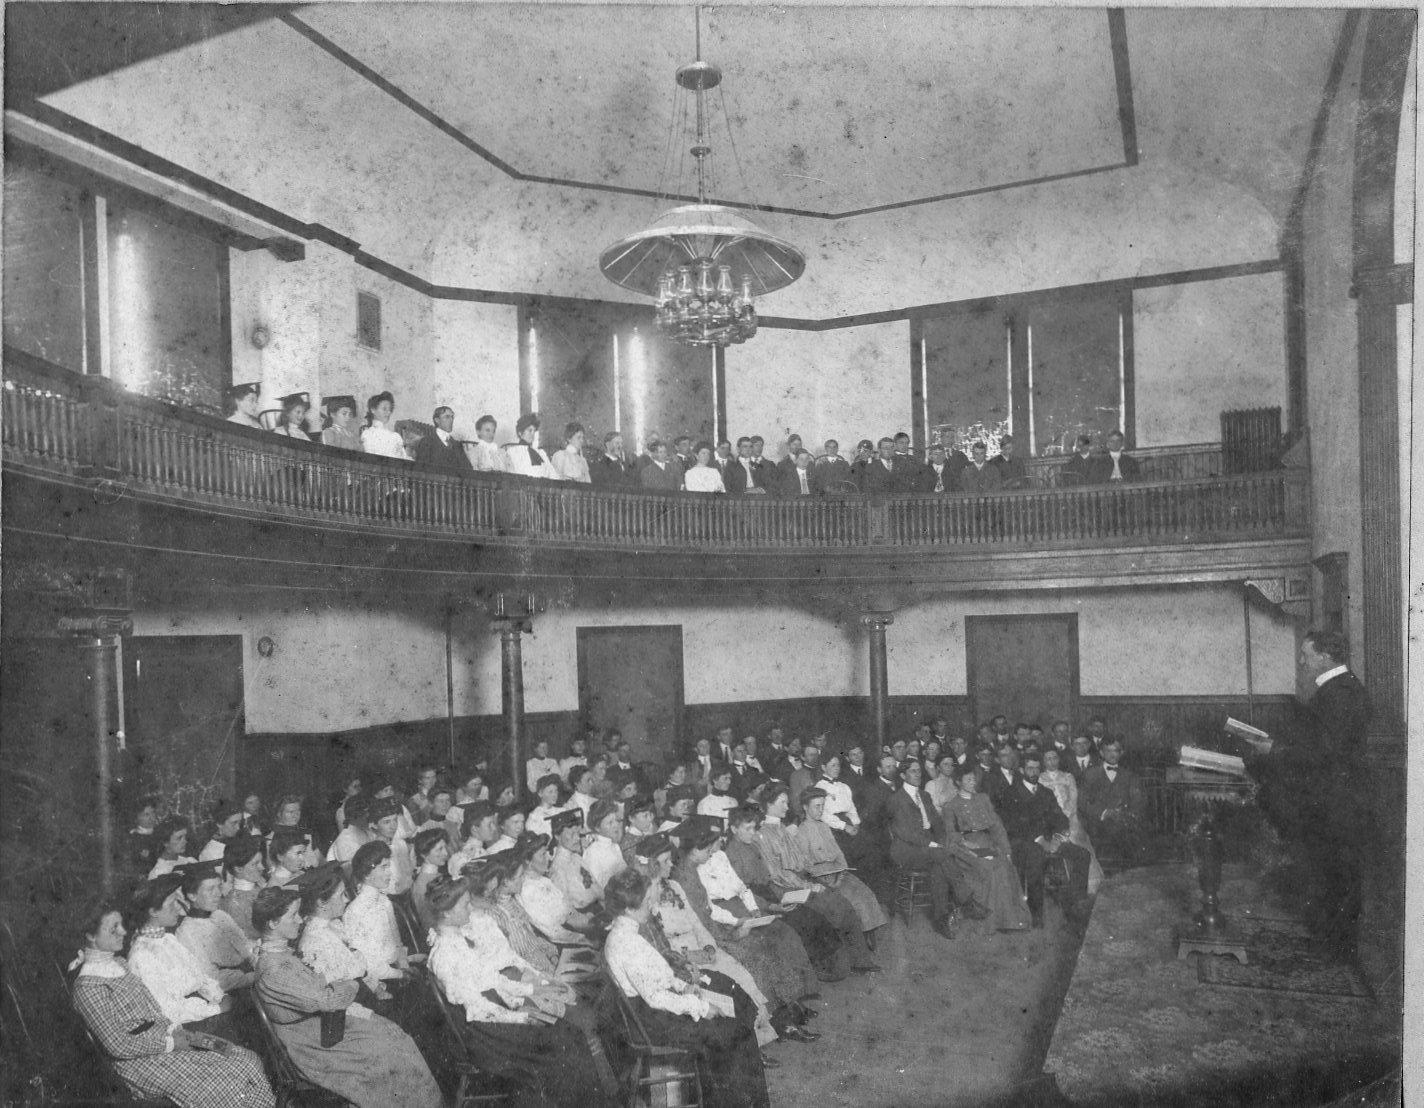 McCormick Hall Interior circa 1903.